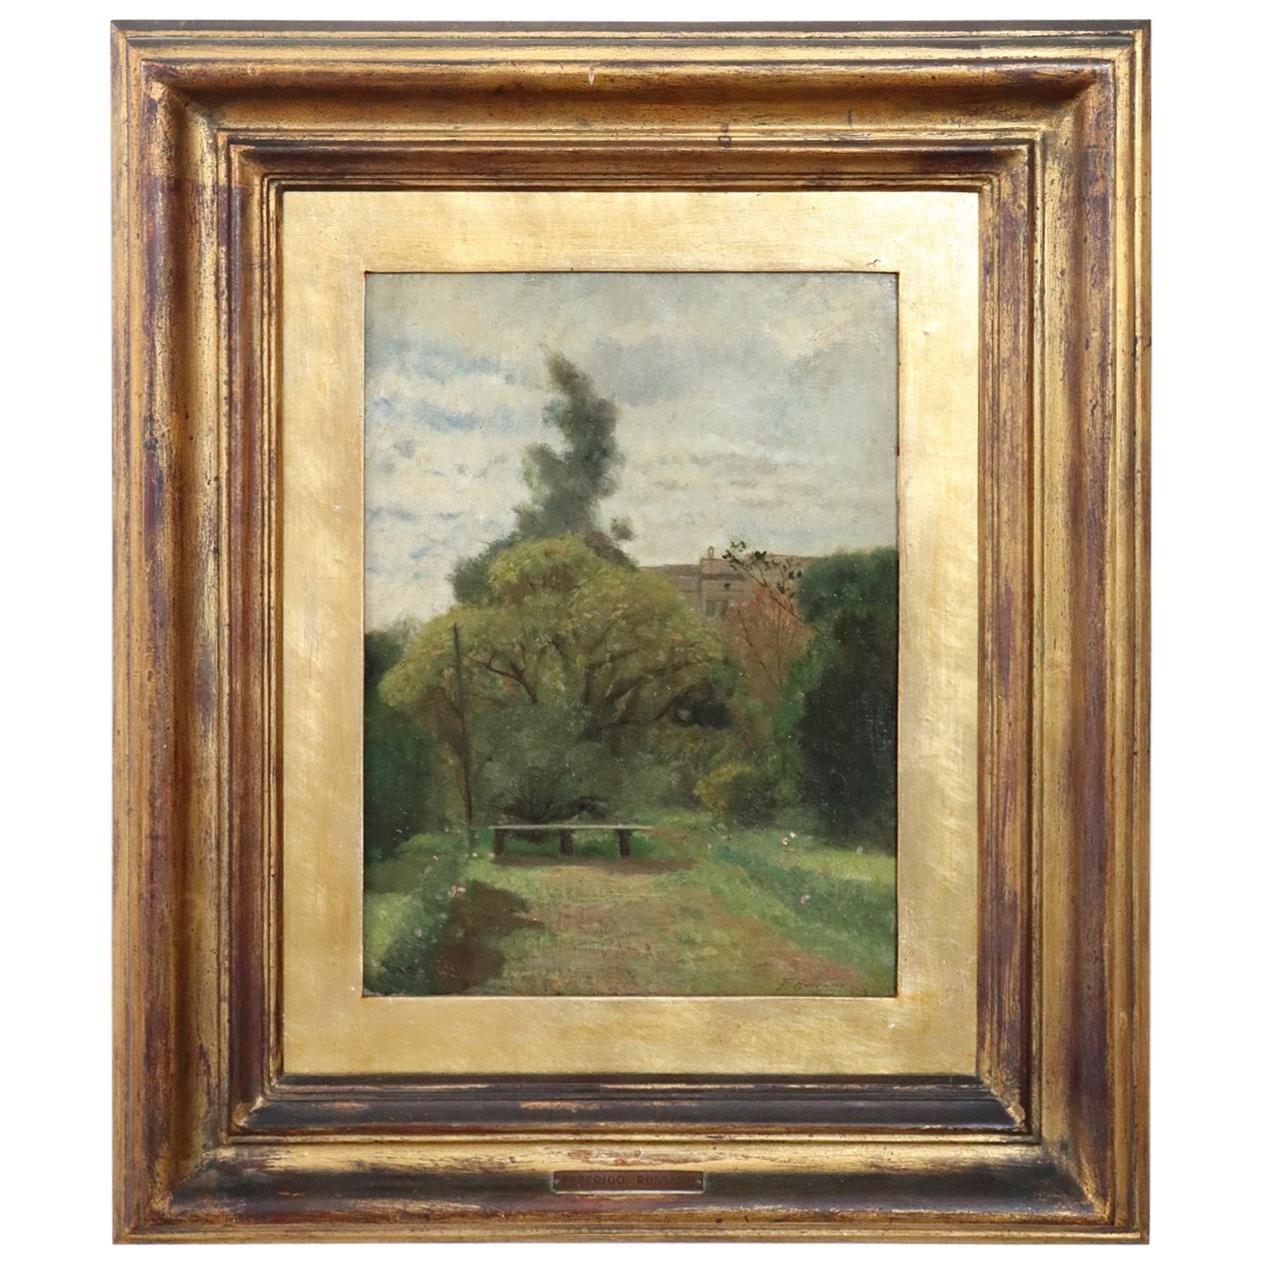 19th Century Important Italian Artist Oil Painting on Canvas Landscape